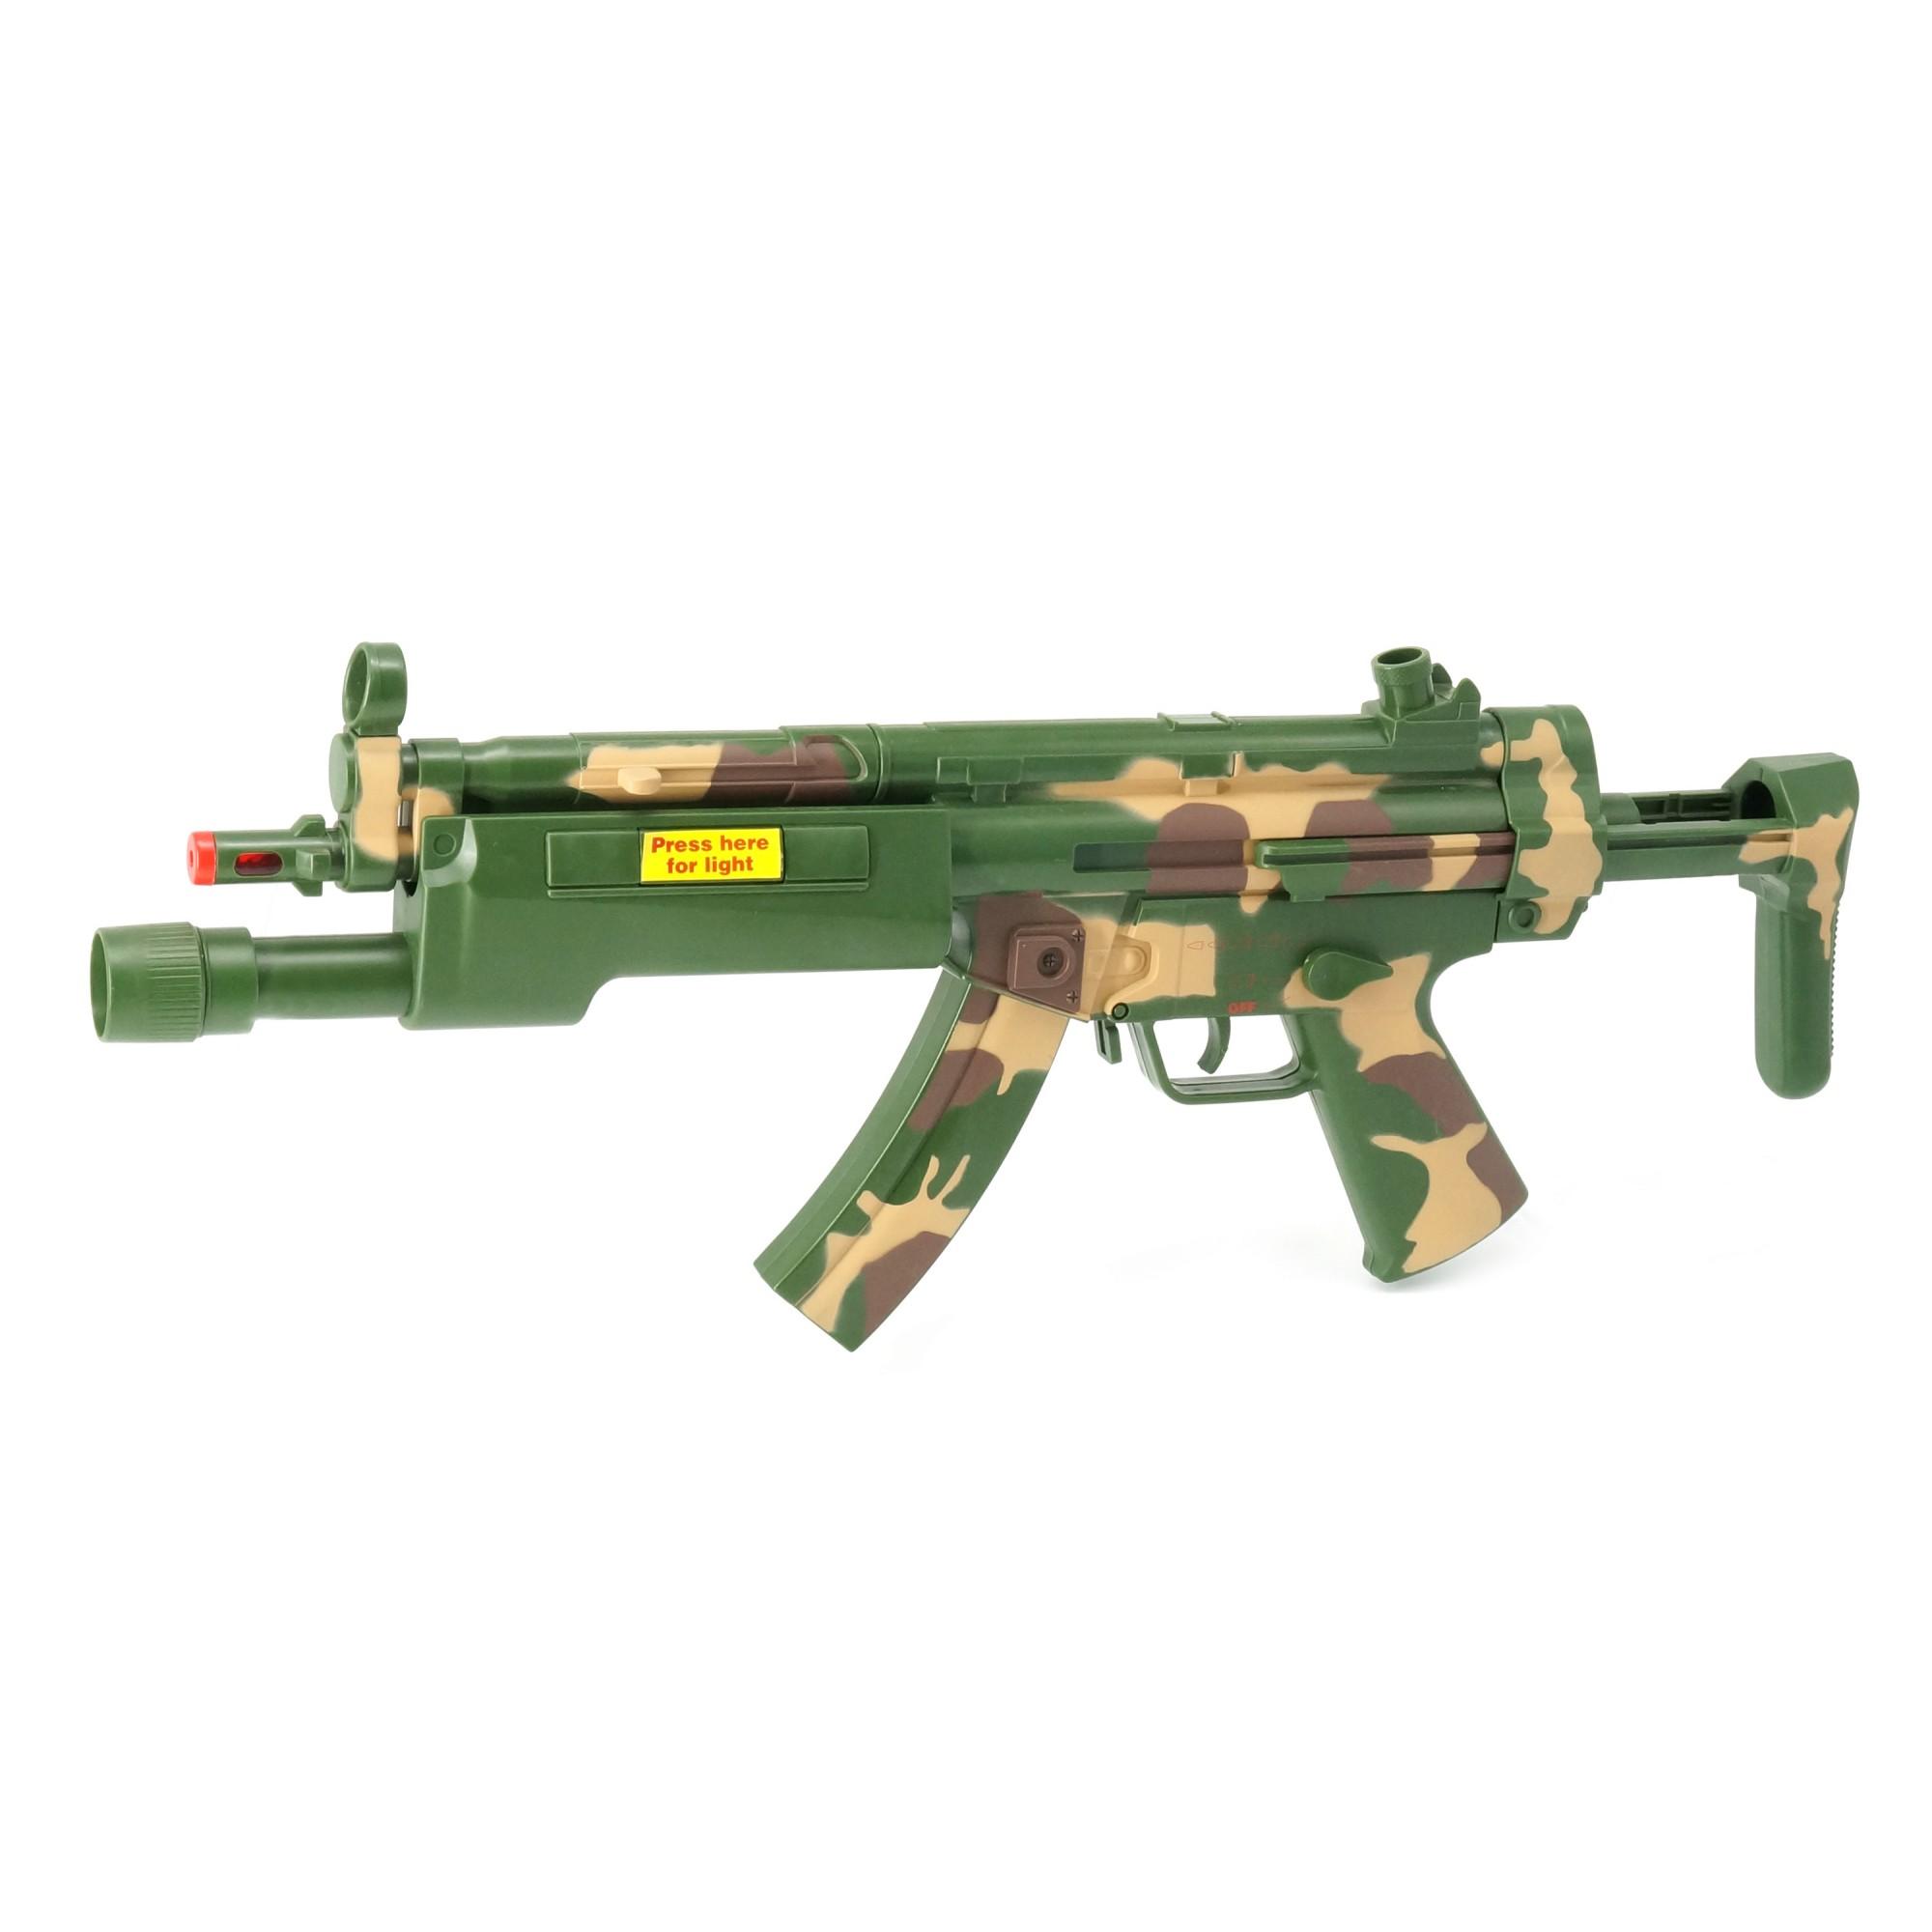 Combat MP5 A5 W/Light, Sound, Vibration